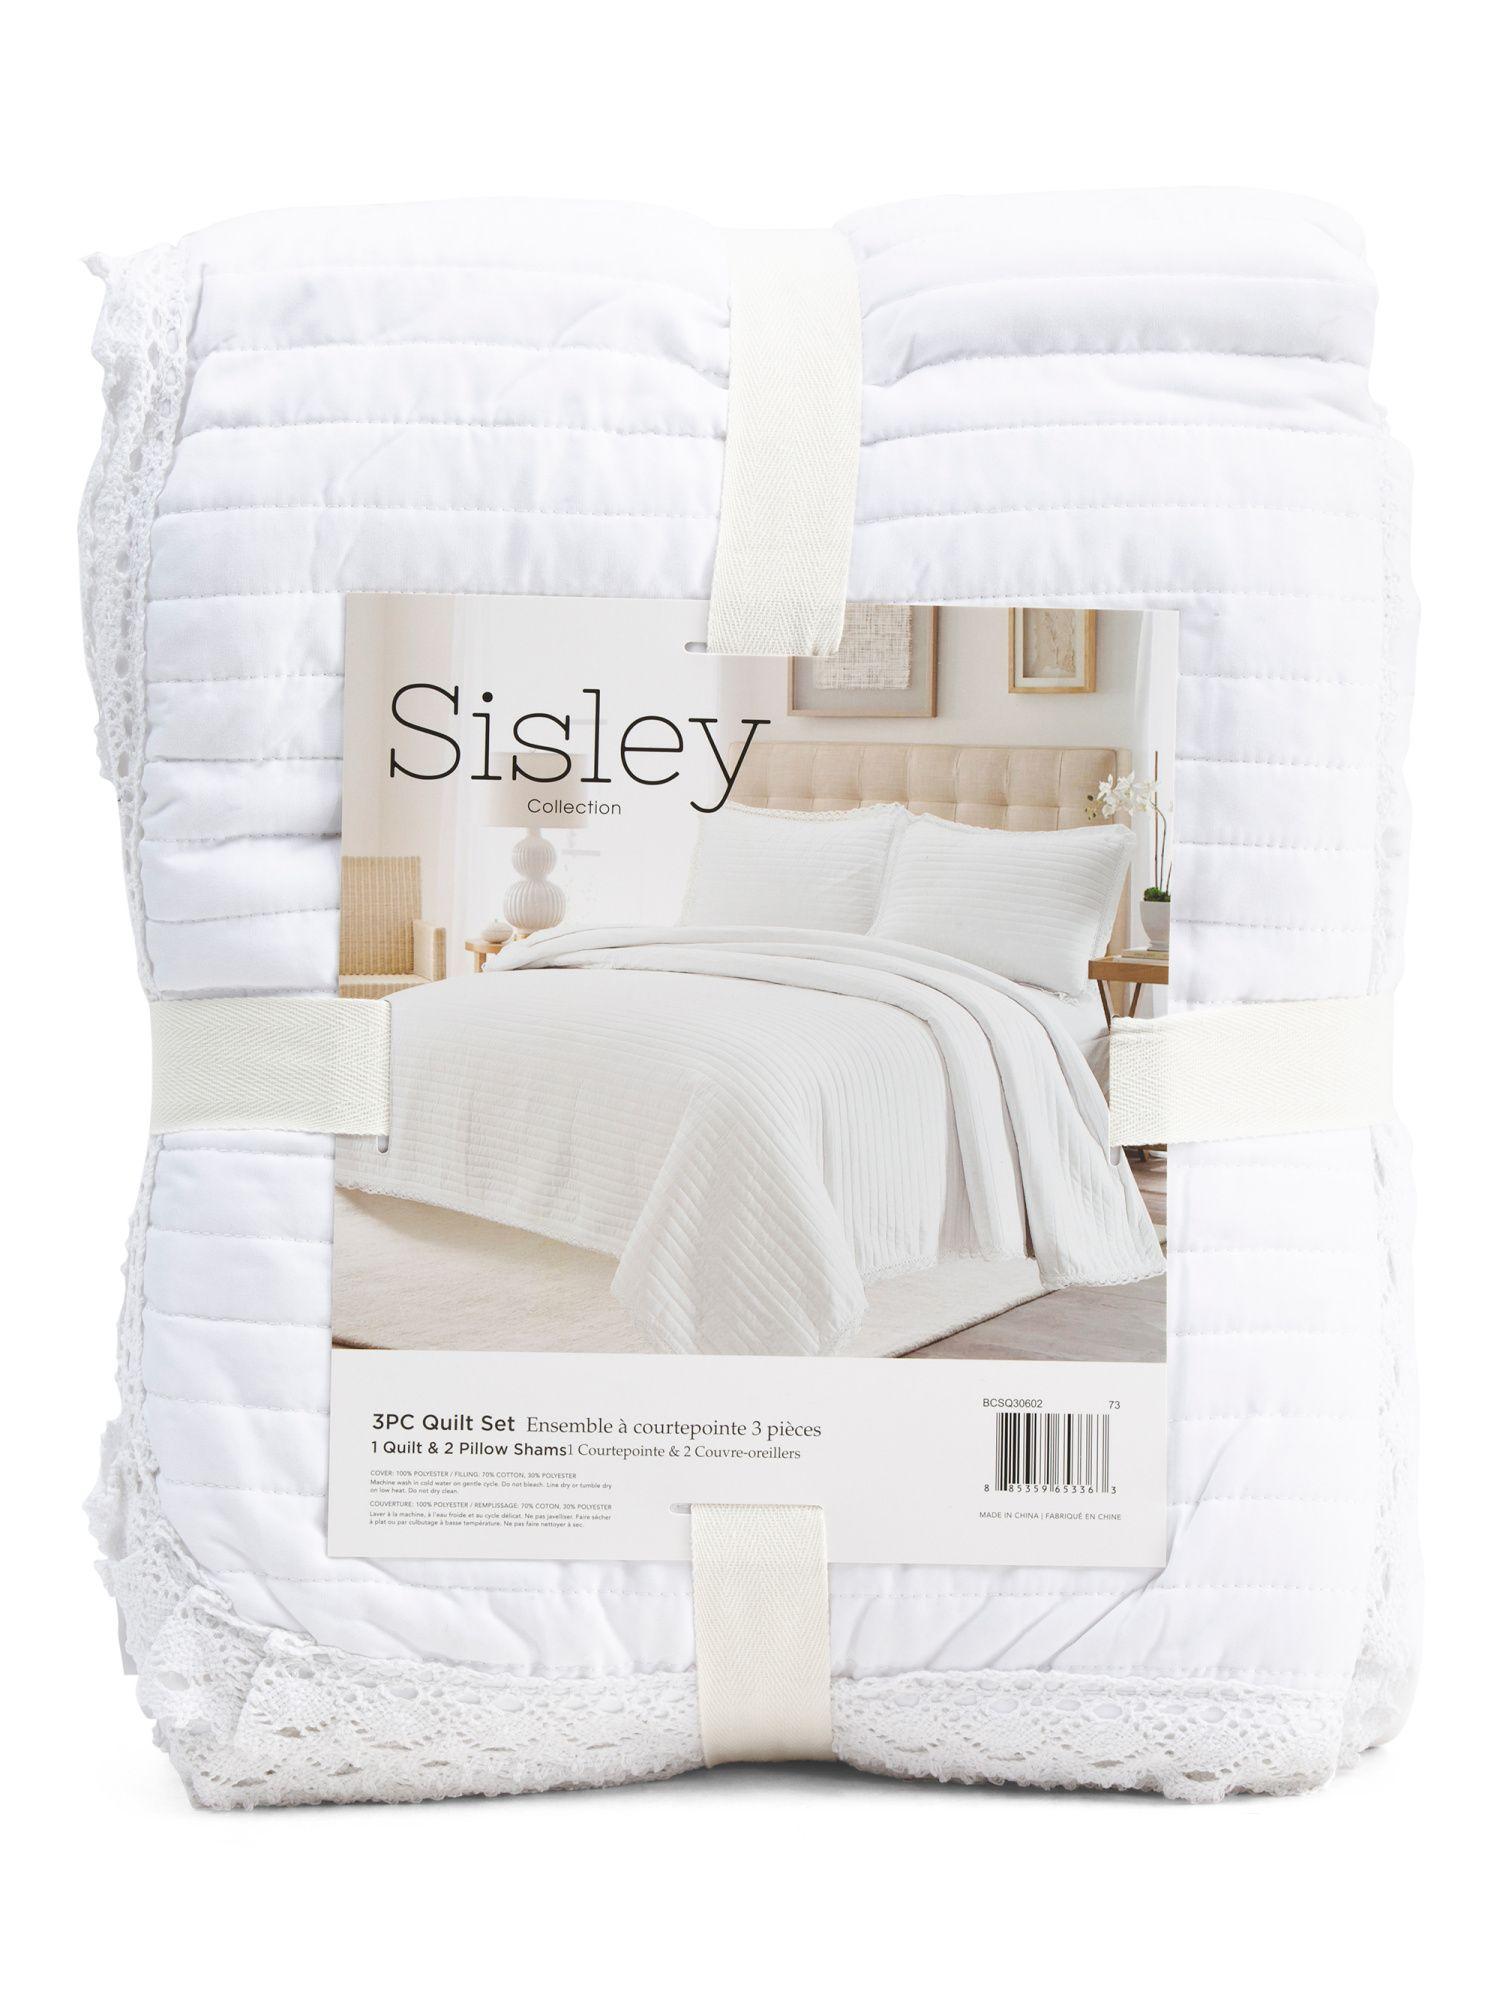 3pc Crochet Quilt Set Bedroom T.J.Maxx in 2020 Quilt